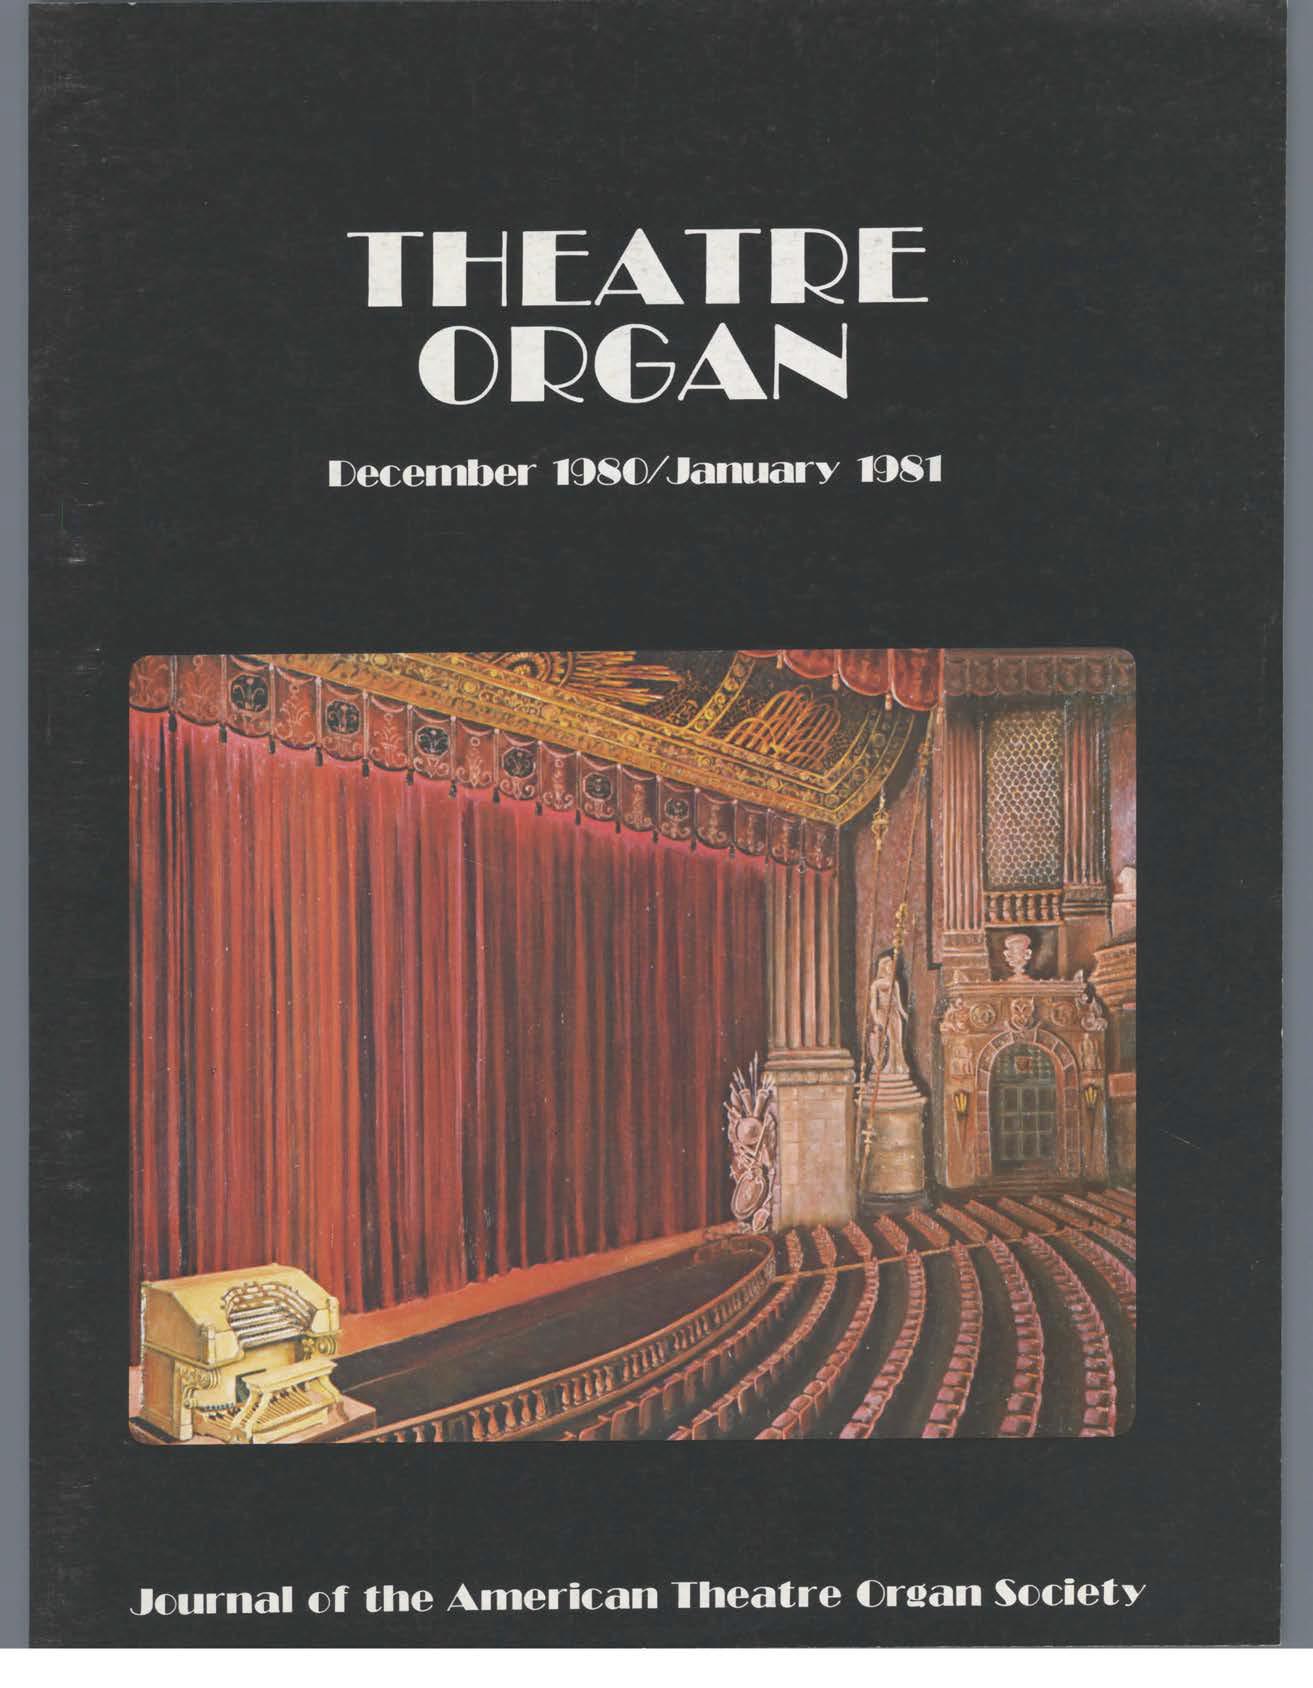 Theatre Organ, December - January 1980, Volume 22, Number 6